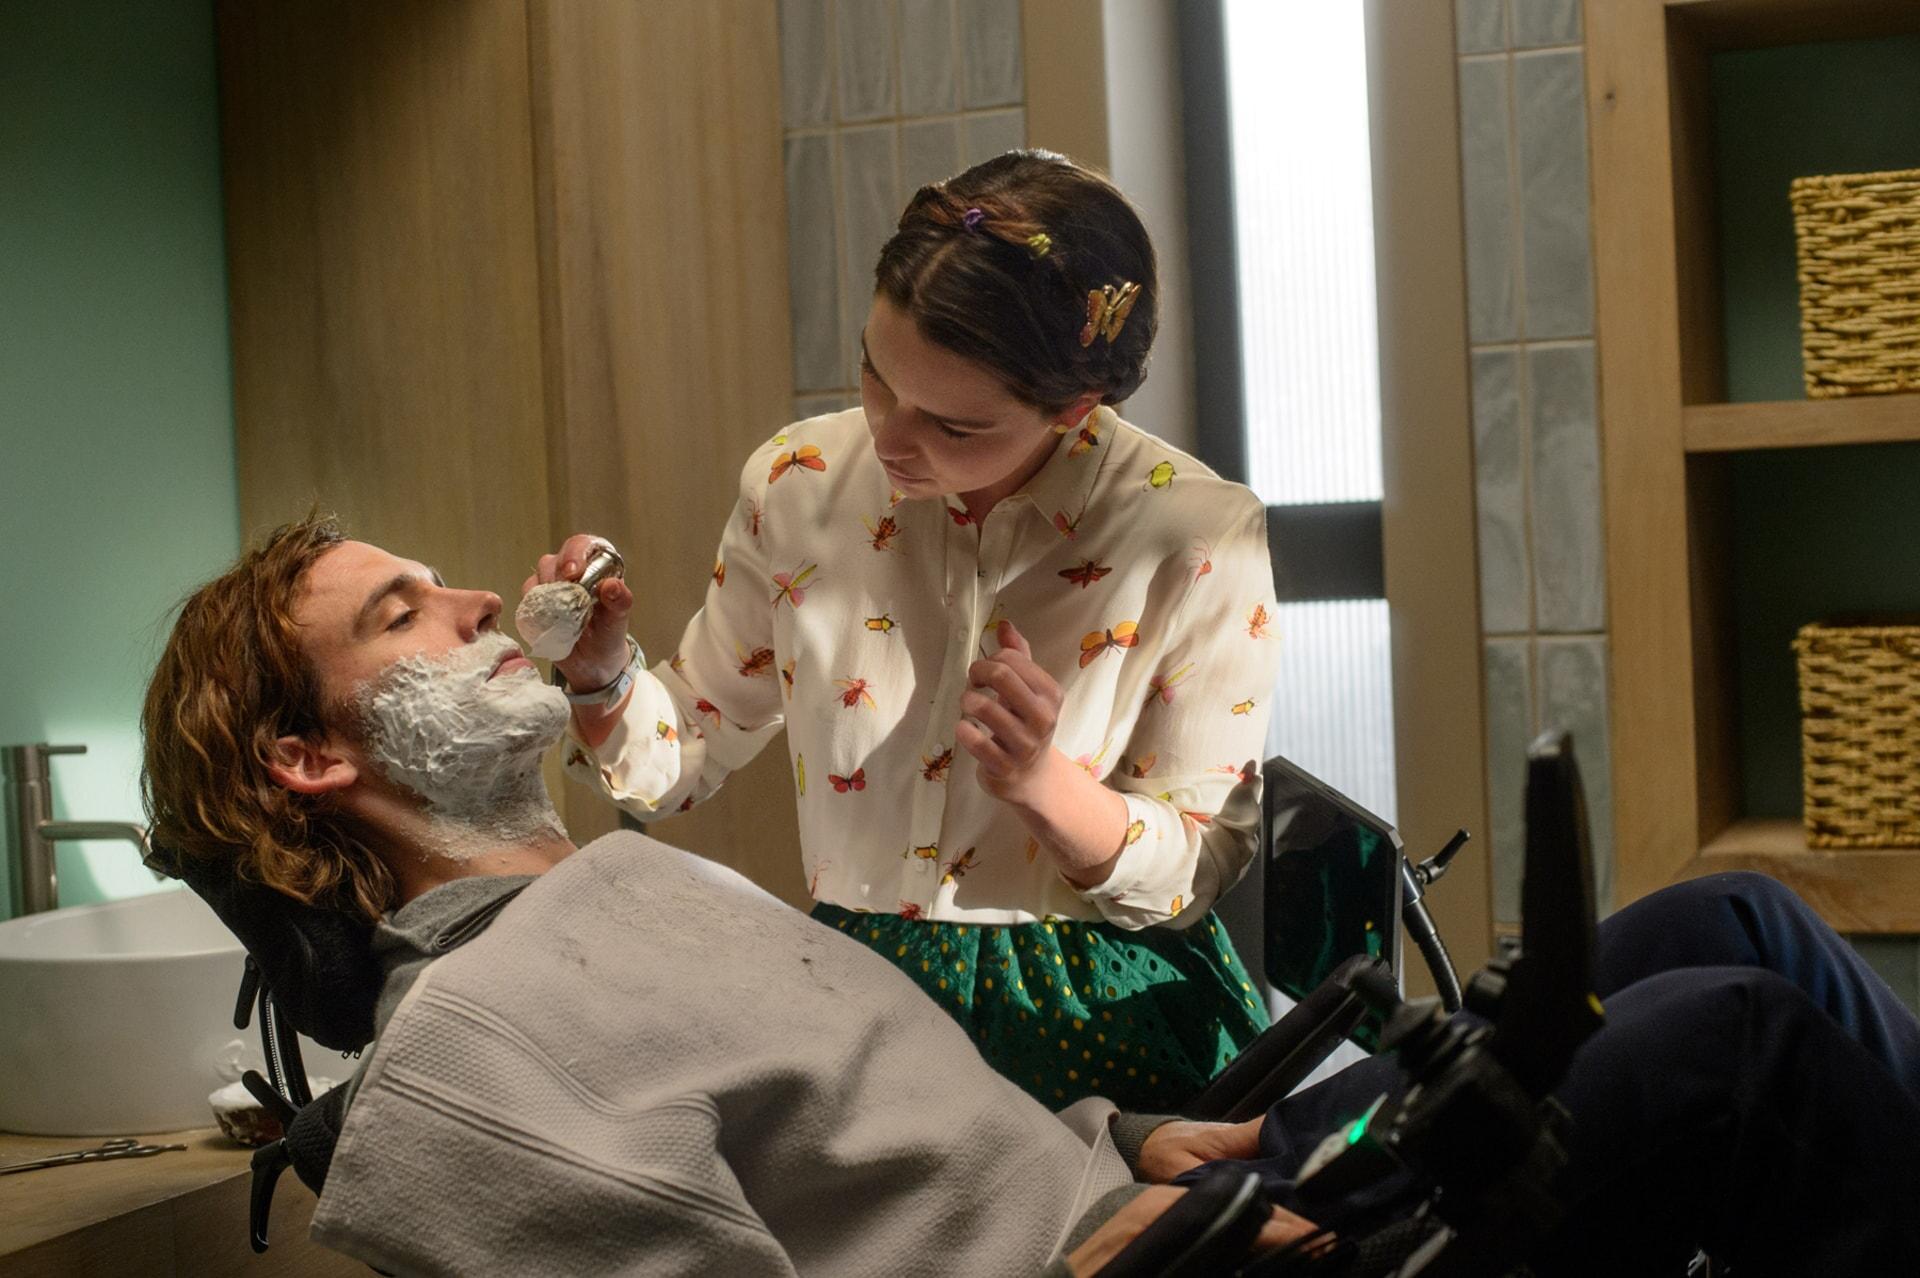 SAM CLAFLIN as Will Traynor lying back in wheelchair and EMILIA CLARKE as Lou Clark shaving his face.